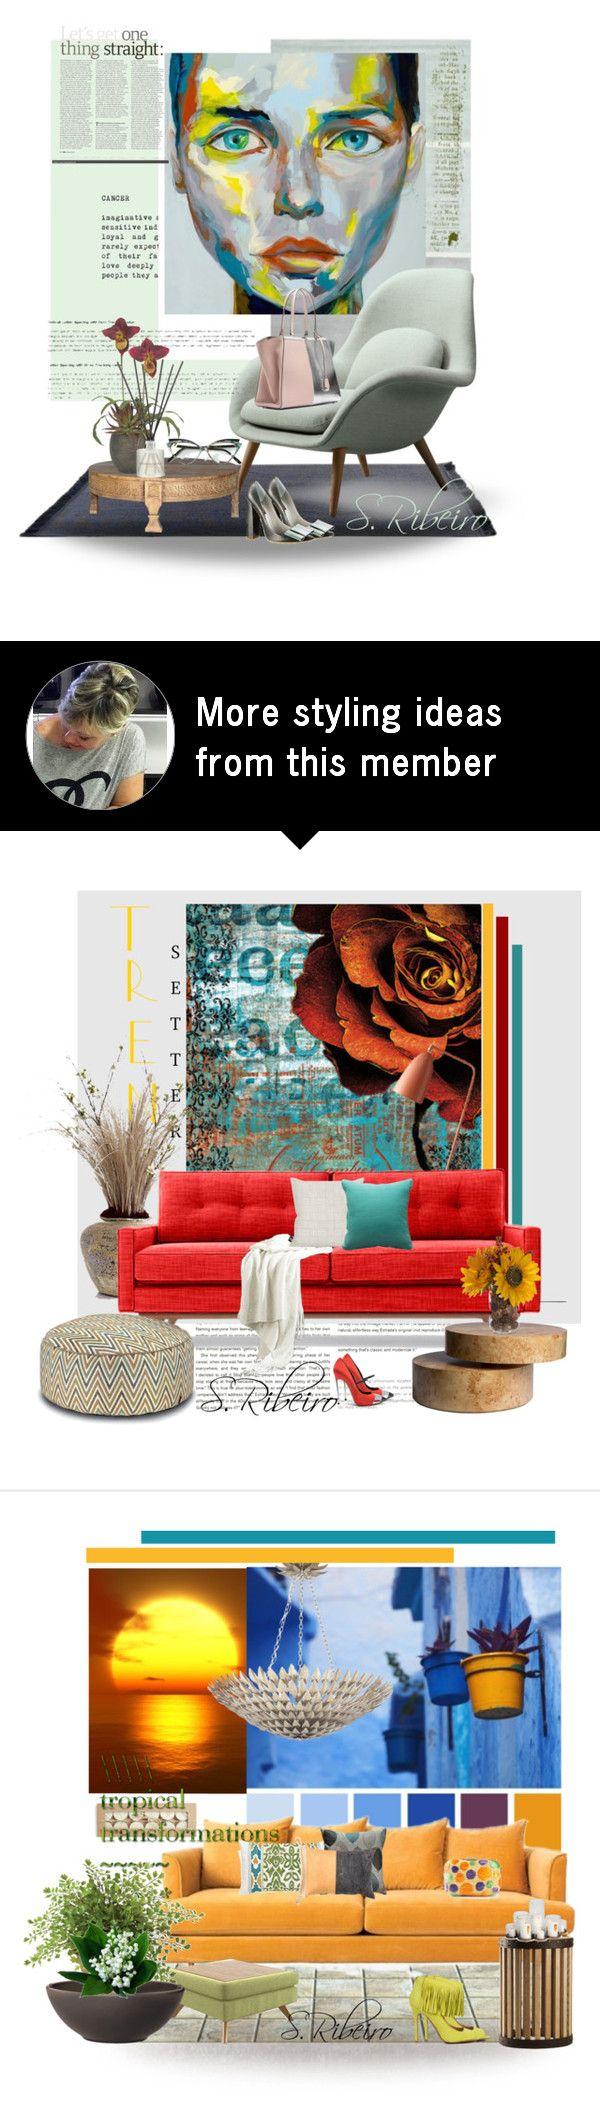 """Sem título #3311"" by sribeiro on Polyvore featuring interior, interiors, interior design, home, home decor, interior decorating, WALL, Jaipur Living, Fendi and Connock London"